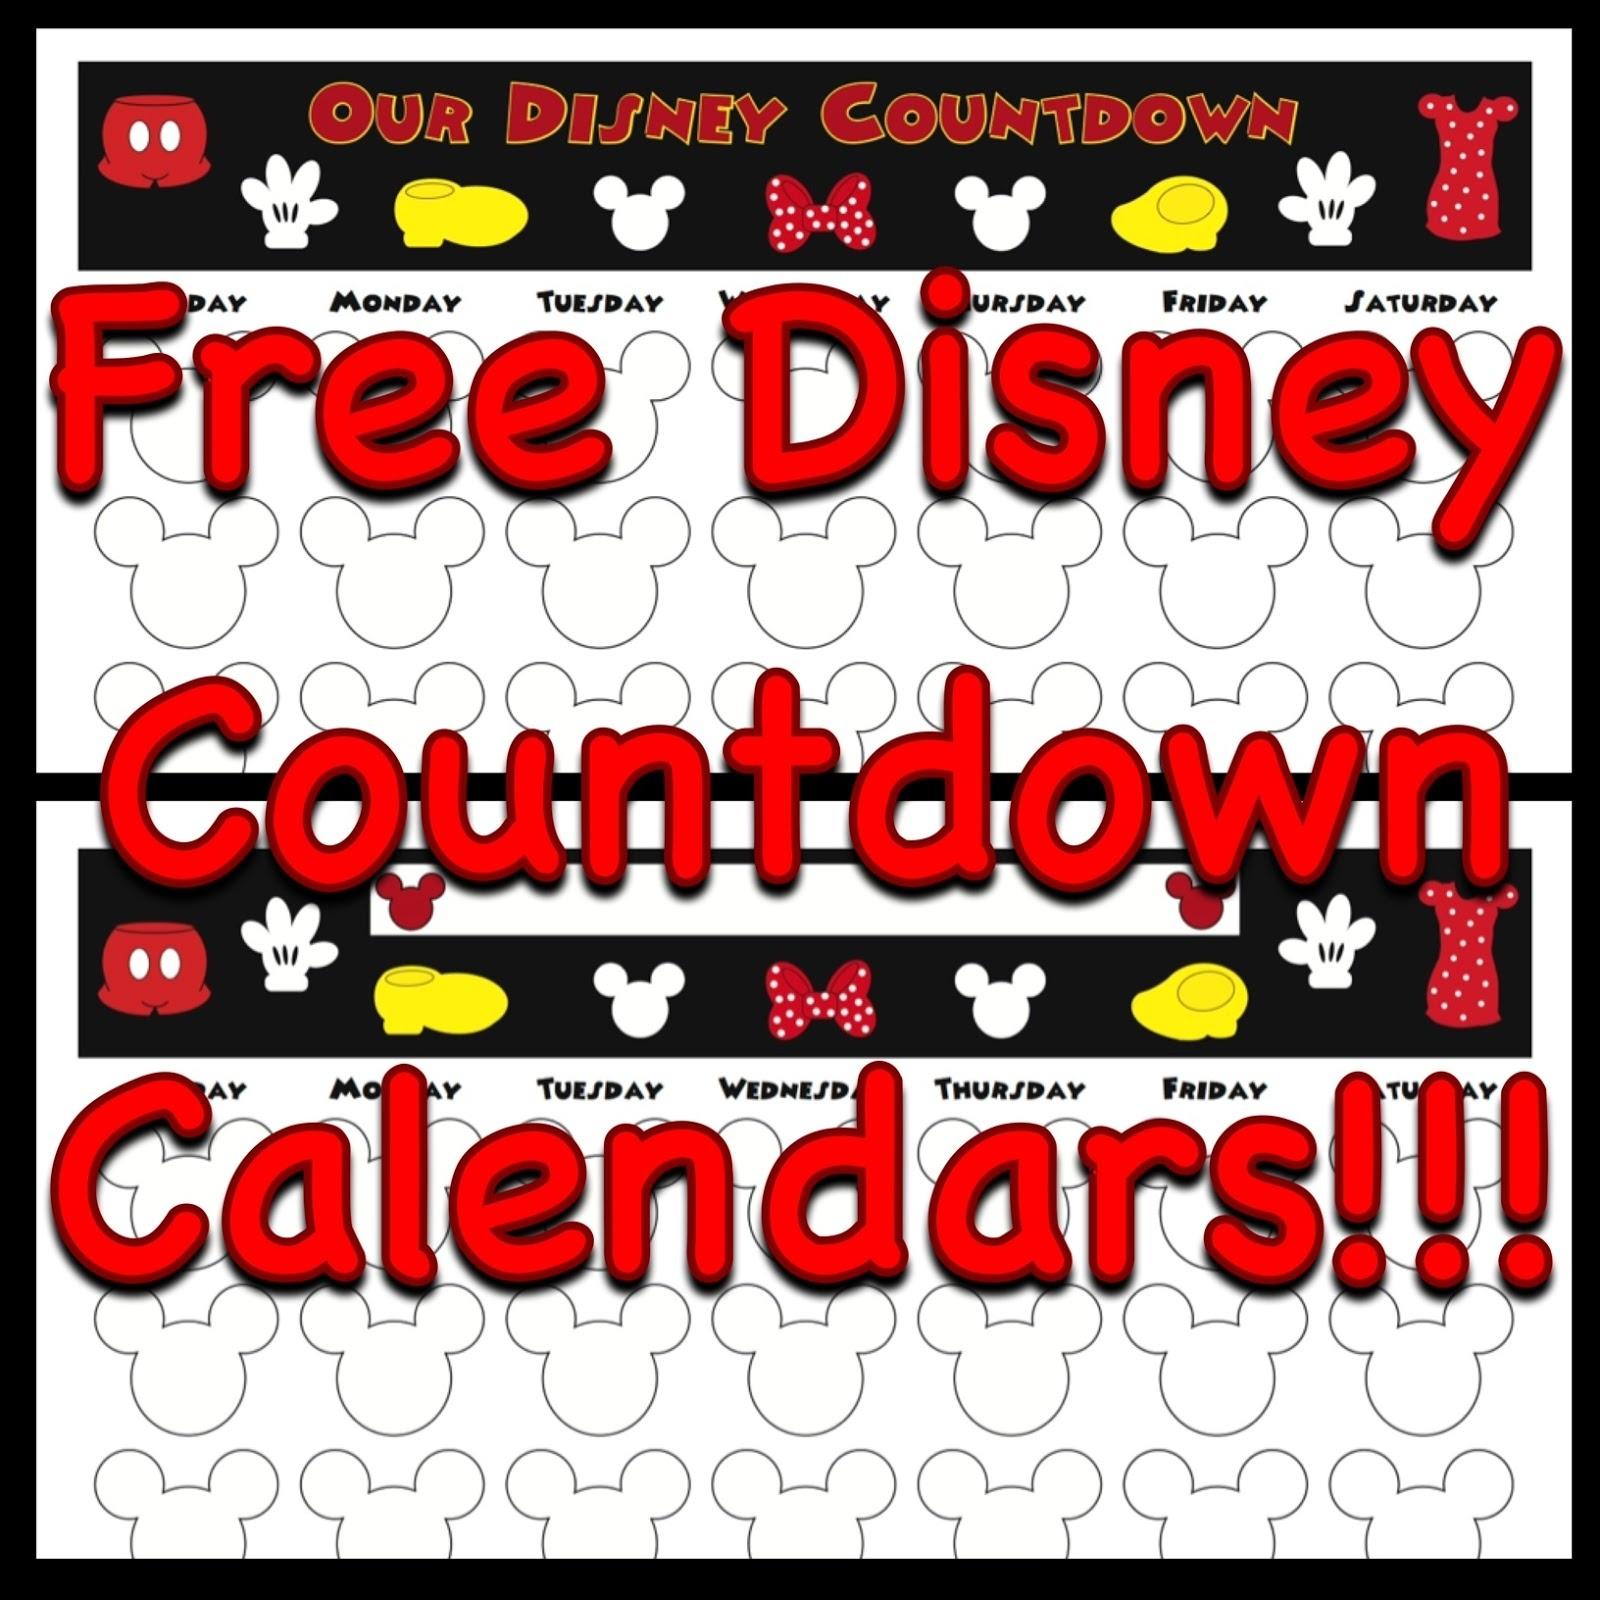 My Disney Life: Countdown Calendars_Countdown Calendar For Cruise